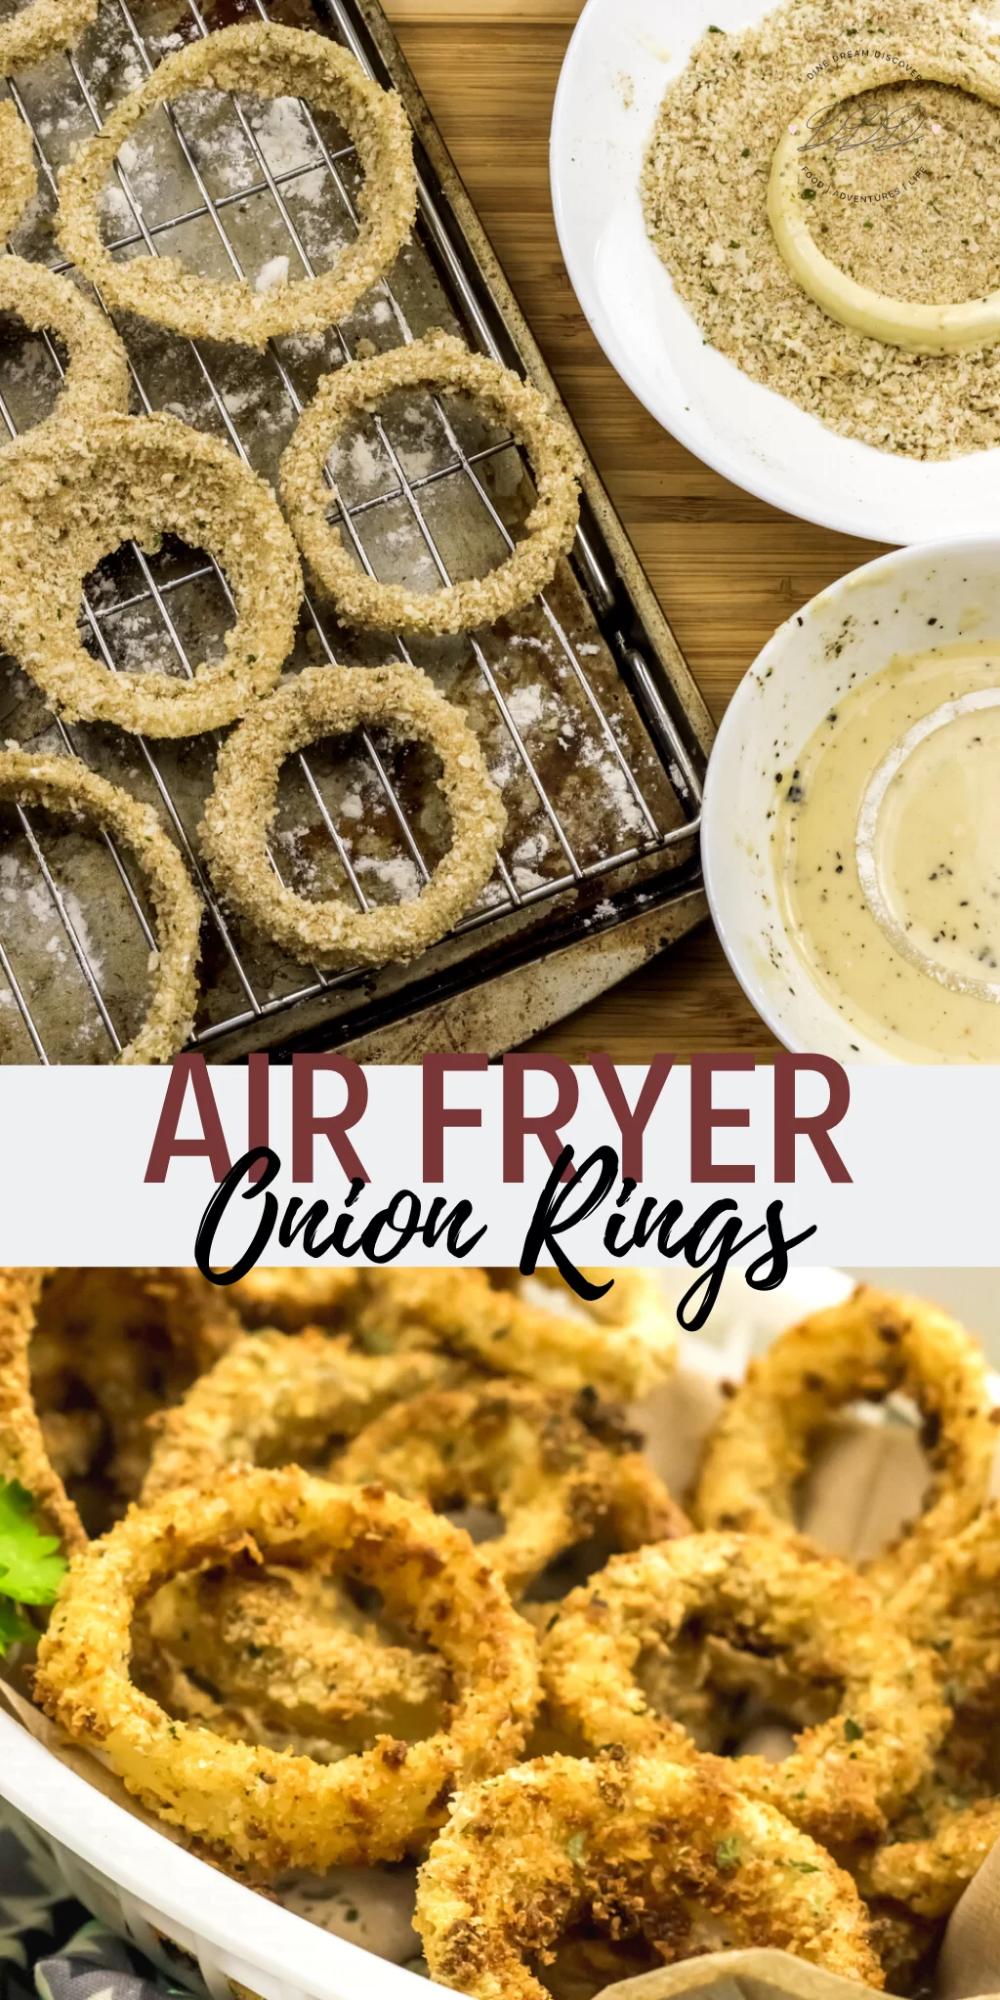 Air Fryer Onion Rings Recipe in 2020 Onion rings